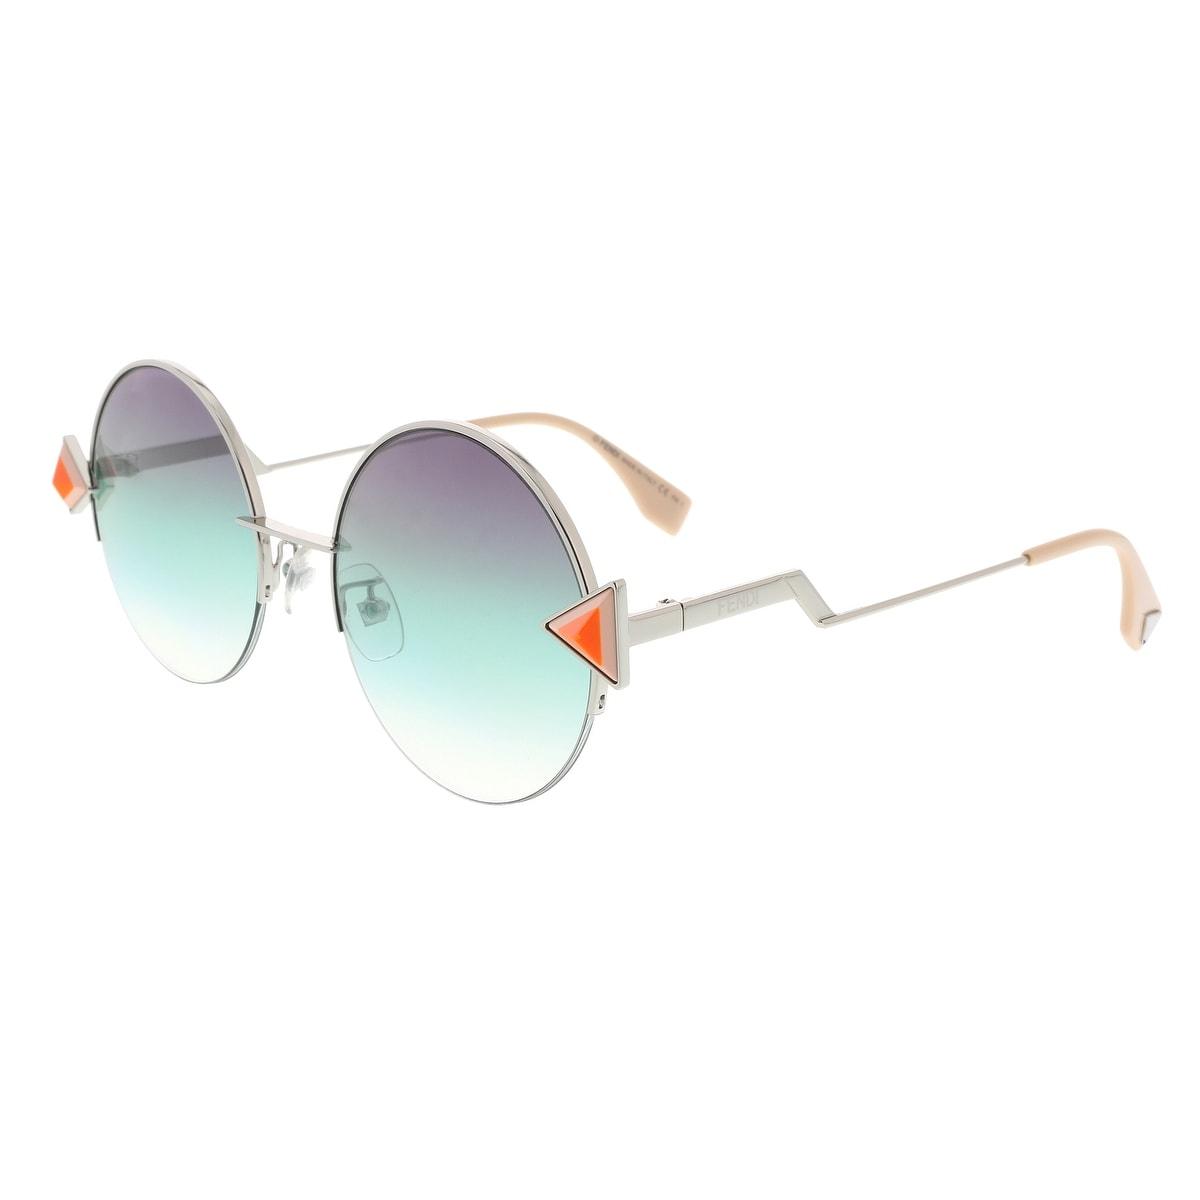 73792cc94135 Fendi Sunglasses